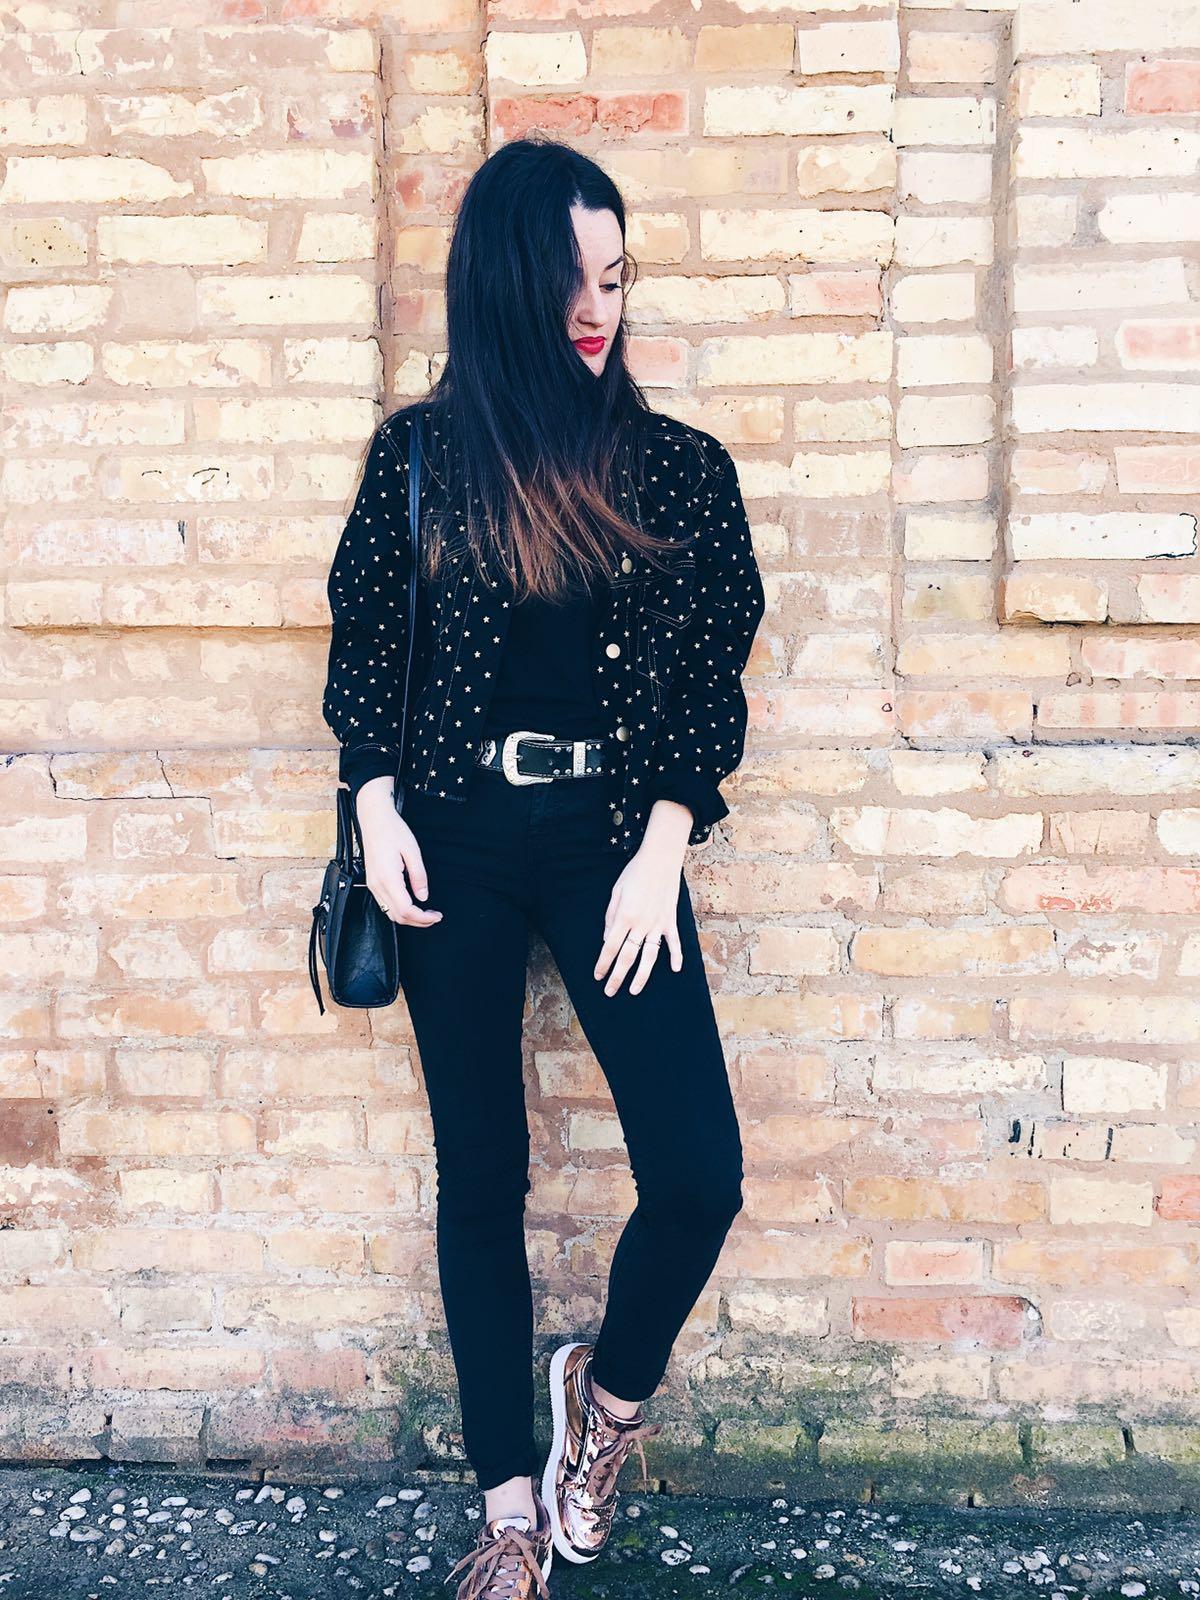 marikowskaya street style rocio chaqueta estrellas (2)